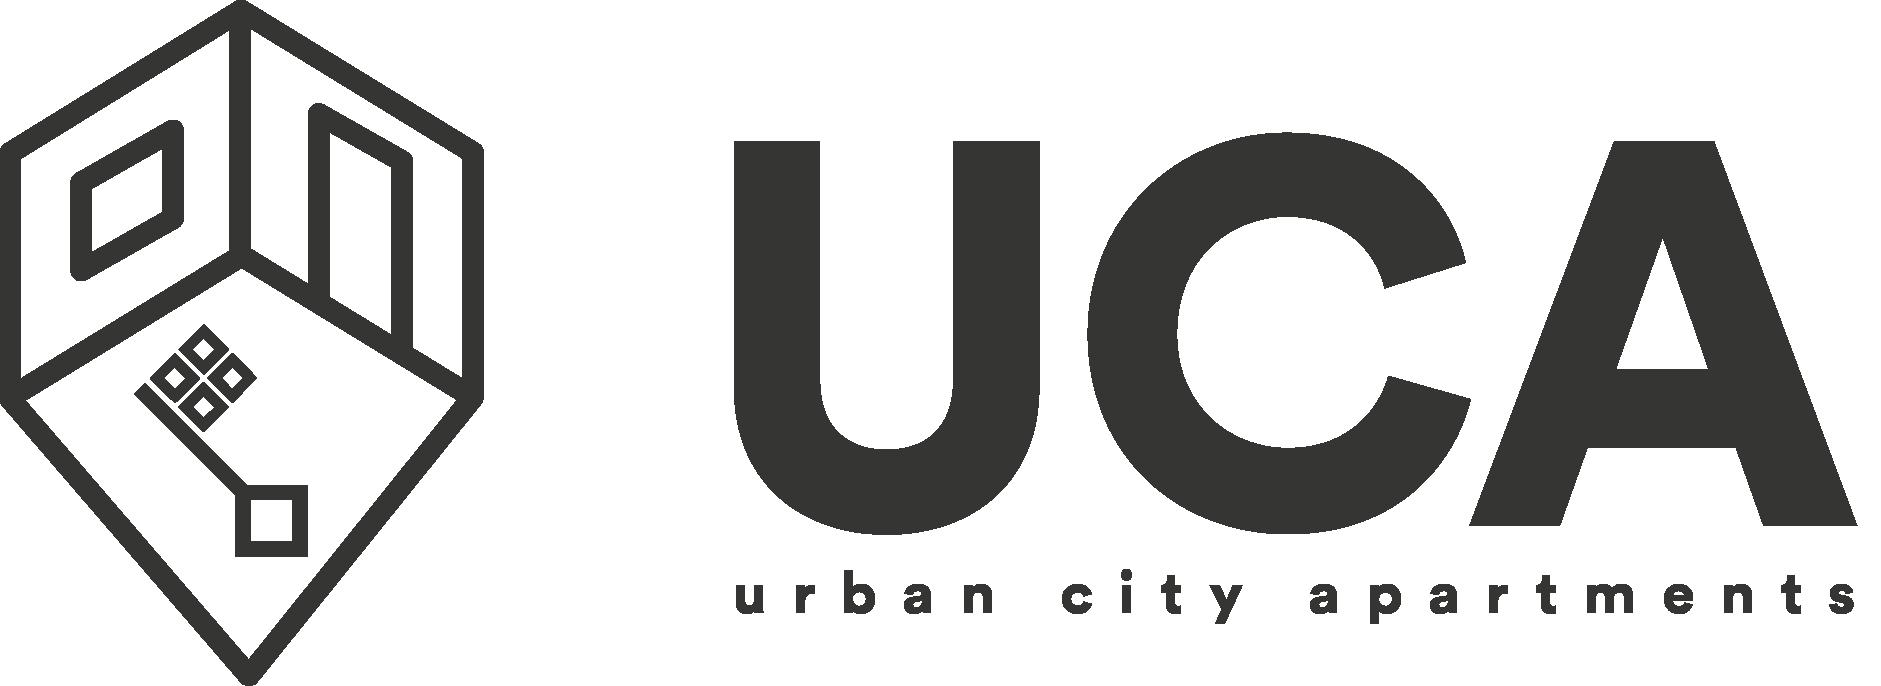 uca_logo_grau